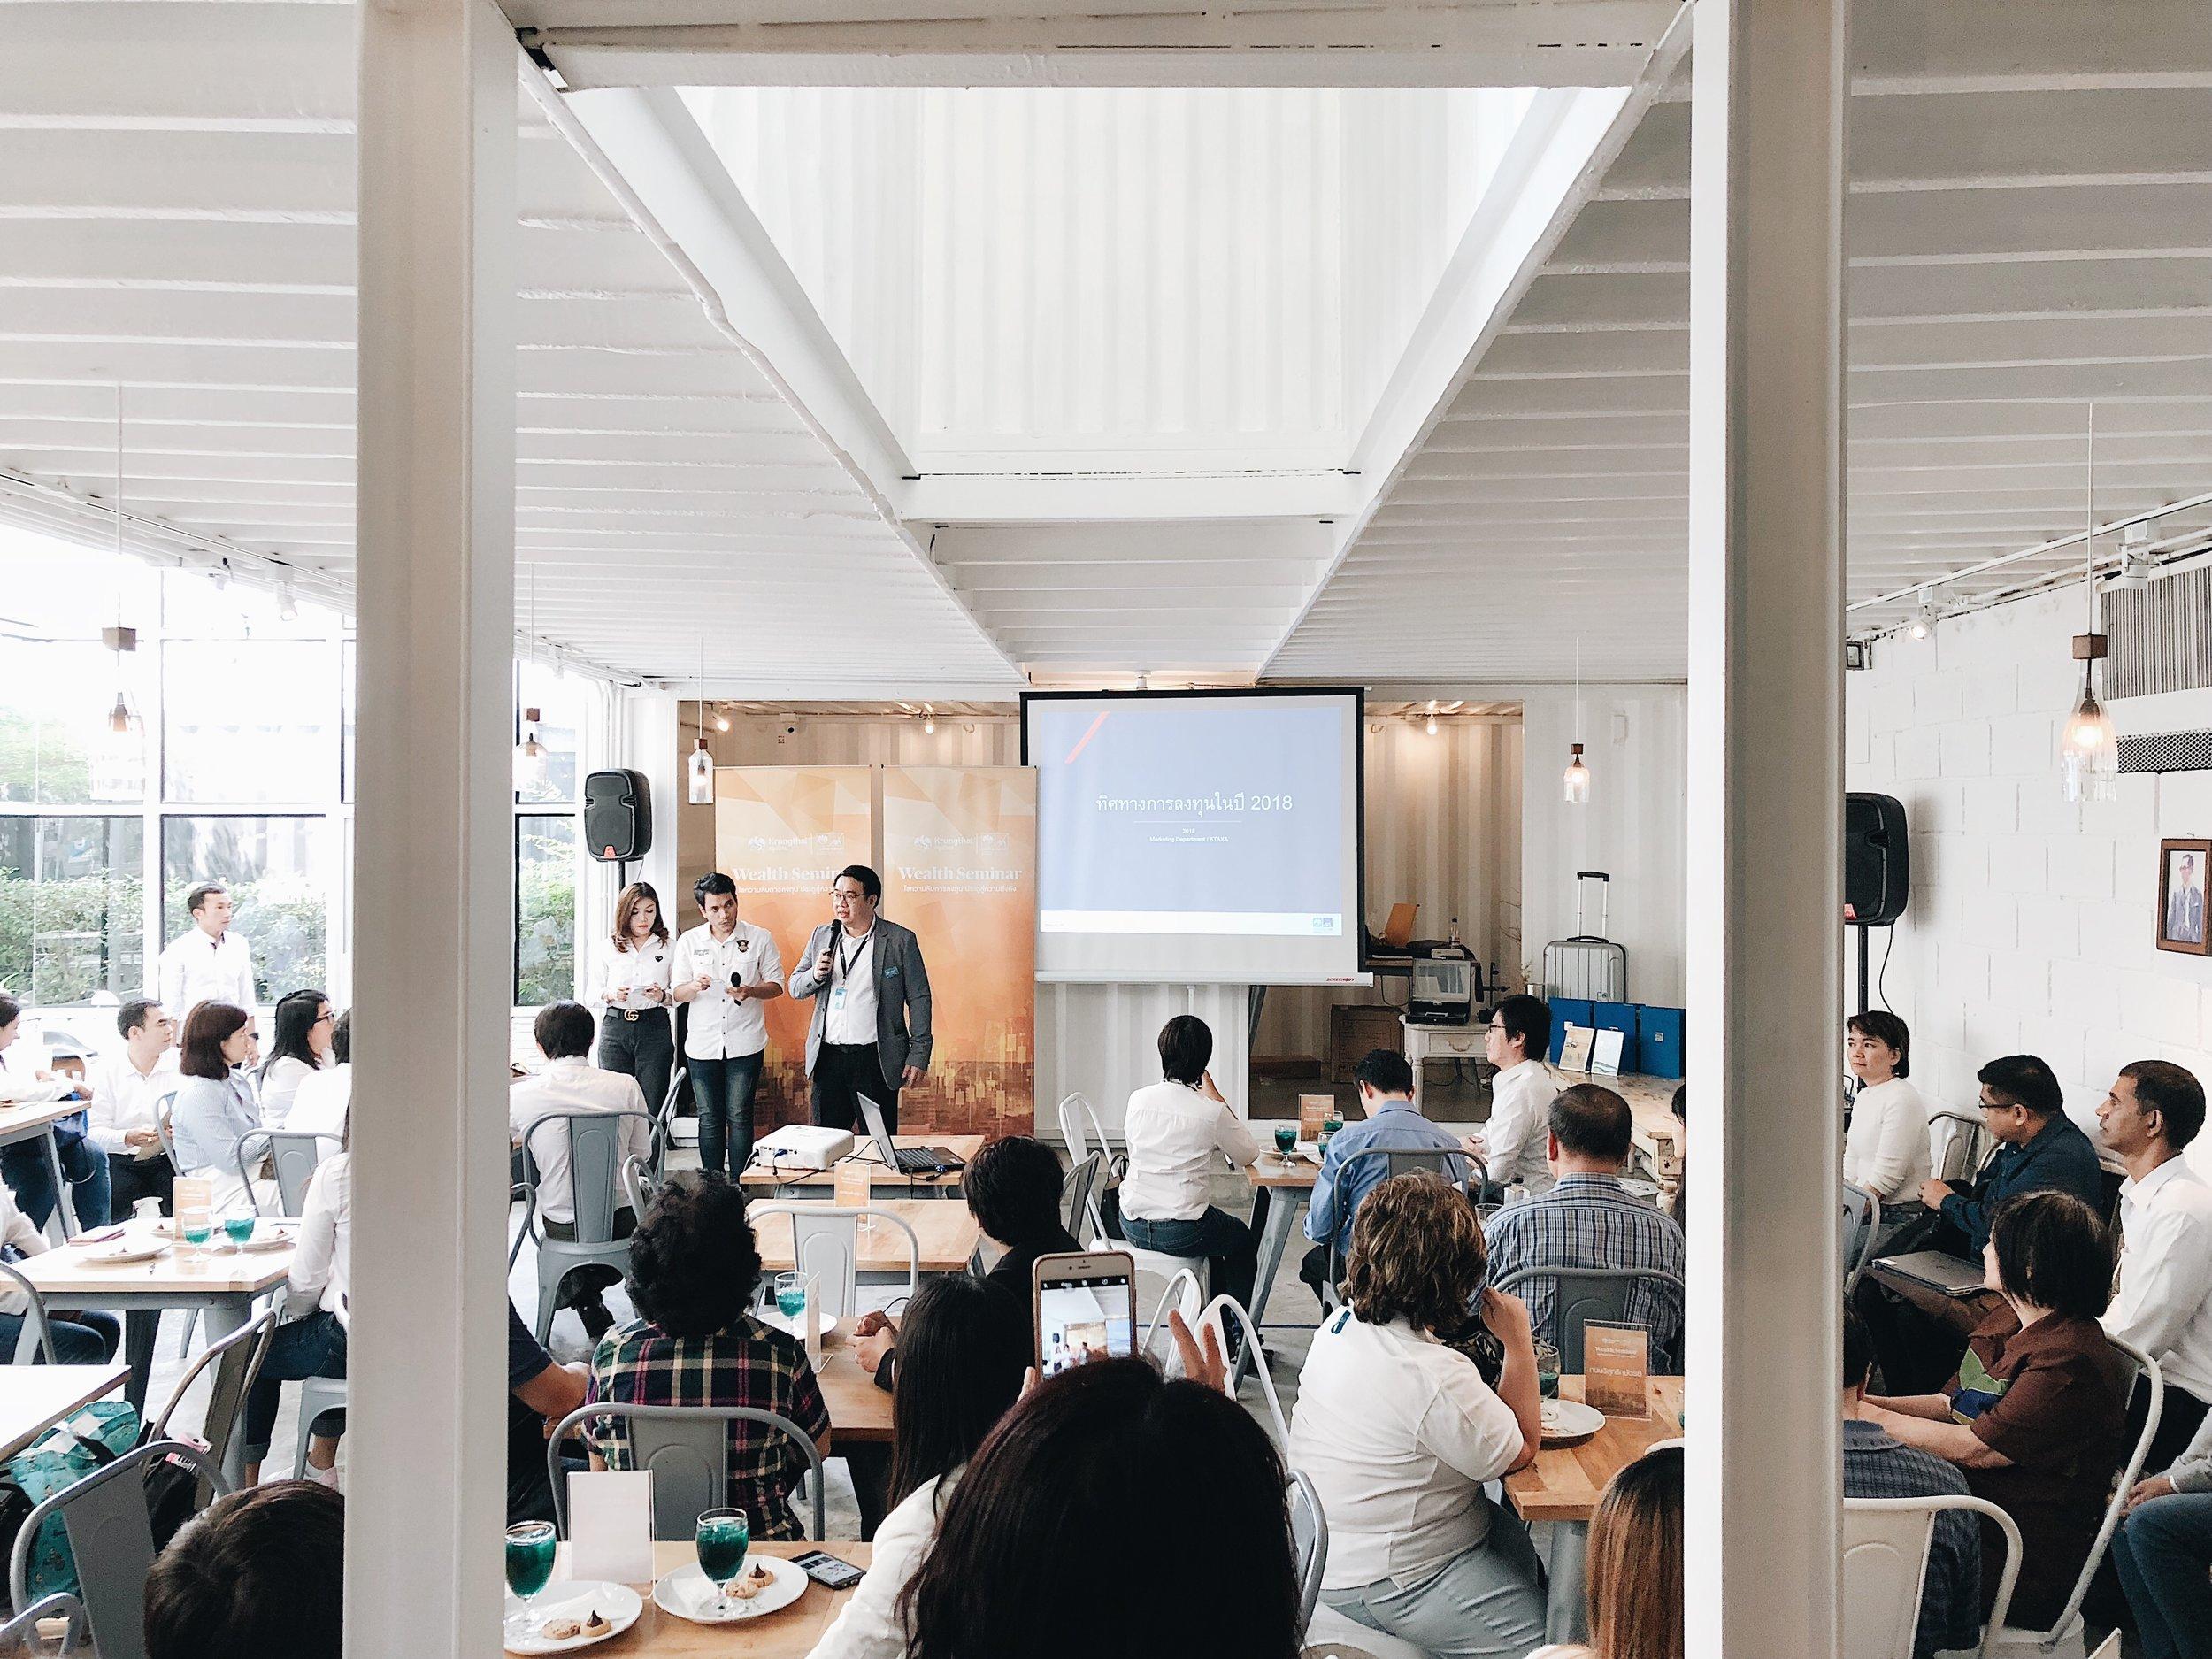 #3 AMBIENCE - บรรยากาศในห้องประชุม ถ้าห้องประชุมในคาเฟ่เหมือนกับห้องประชุมในออฟฟิต ก็คงไม่มีเหตุผลที่ต้องมานั่งประชุมในคาเฟ่ ห้องที่มีความแตกต่าง และสถานที่ที่มีความแปลกใหม่สามารถสร้างแรงบันดาลใจให้การประชุมมีผลลัพย์่ที่ดีขึ้นก็ได้ ห้องประชุมที่มีหน้าต่างรอบ มองเห็นต้นไม้ทำให้สบายตา มีความแตกต่างจากห้องในตึกที่มีแต่กำแพงTHE BLOC มีห้องประชุมให้เลือกหลายขนาด โดยทุกห้องมีความเป็นส่วนตัวและมีประตูกระจกกั้นทุกห้อง โดยมีขนาดตั้งแต่ 4ท่าน ถึง 50 ท่าน ดูรายละเอียดห้องประชุมได้ที่ Link